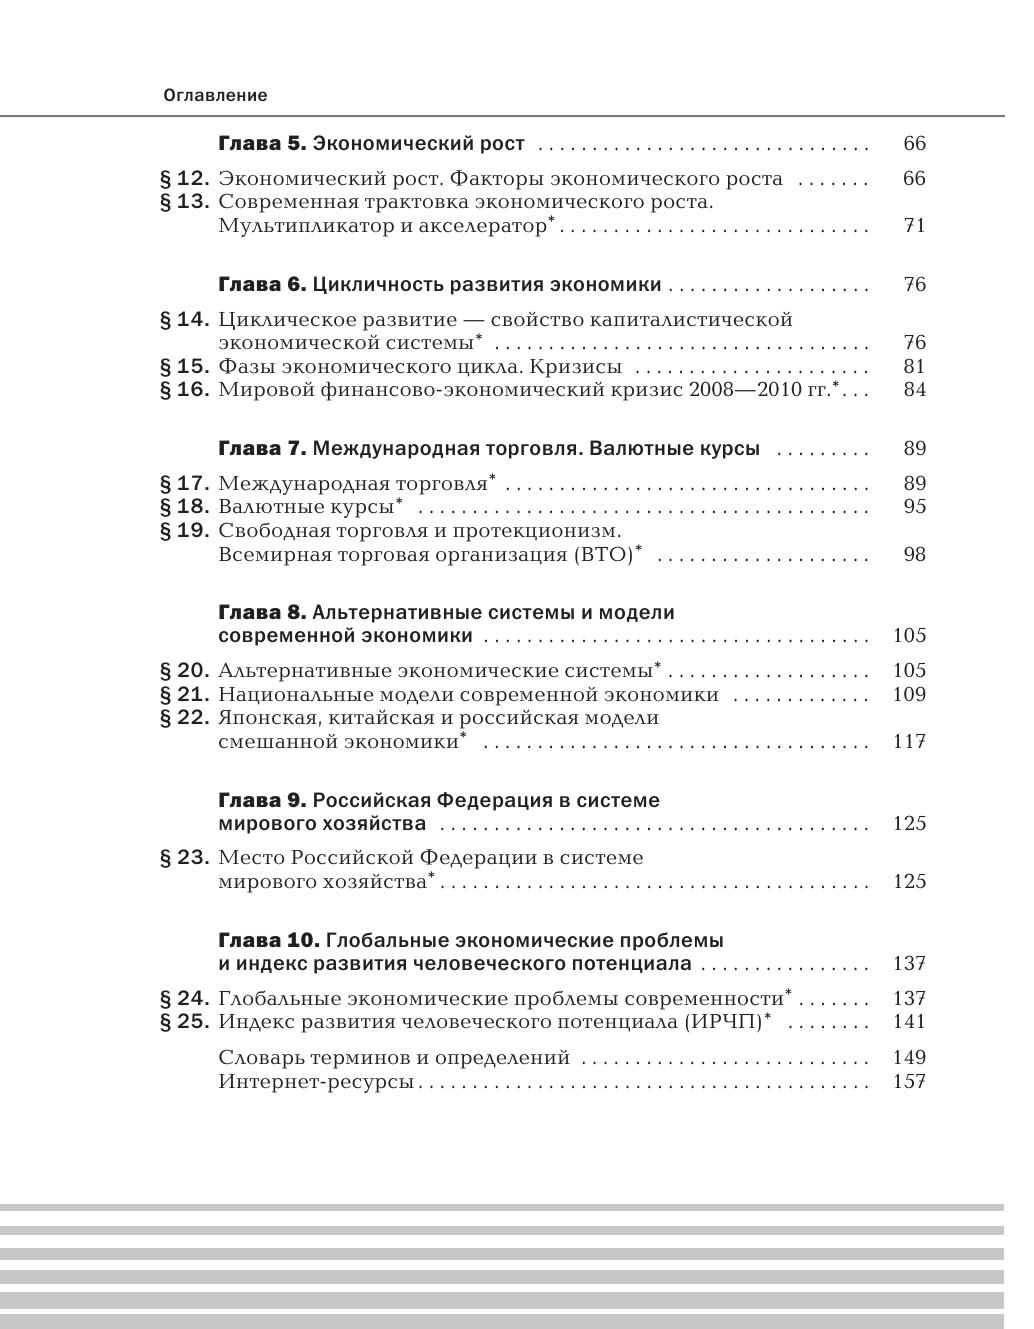 Практикум экономика 10-11 класс методичка онлайн